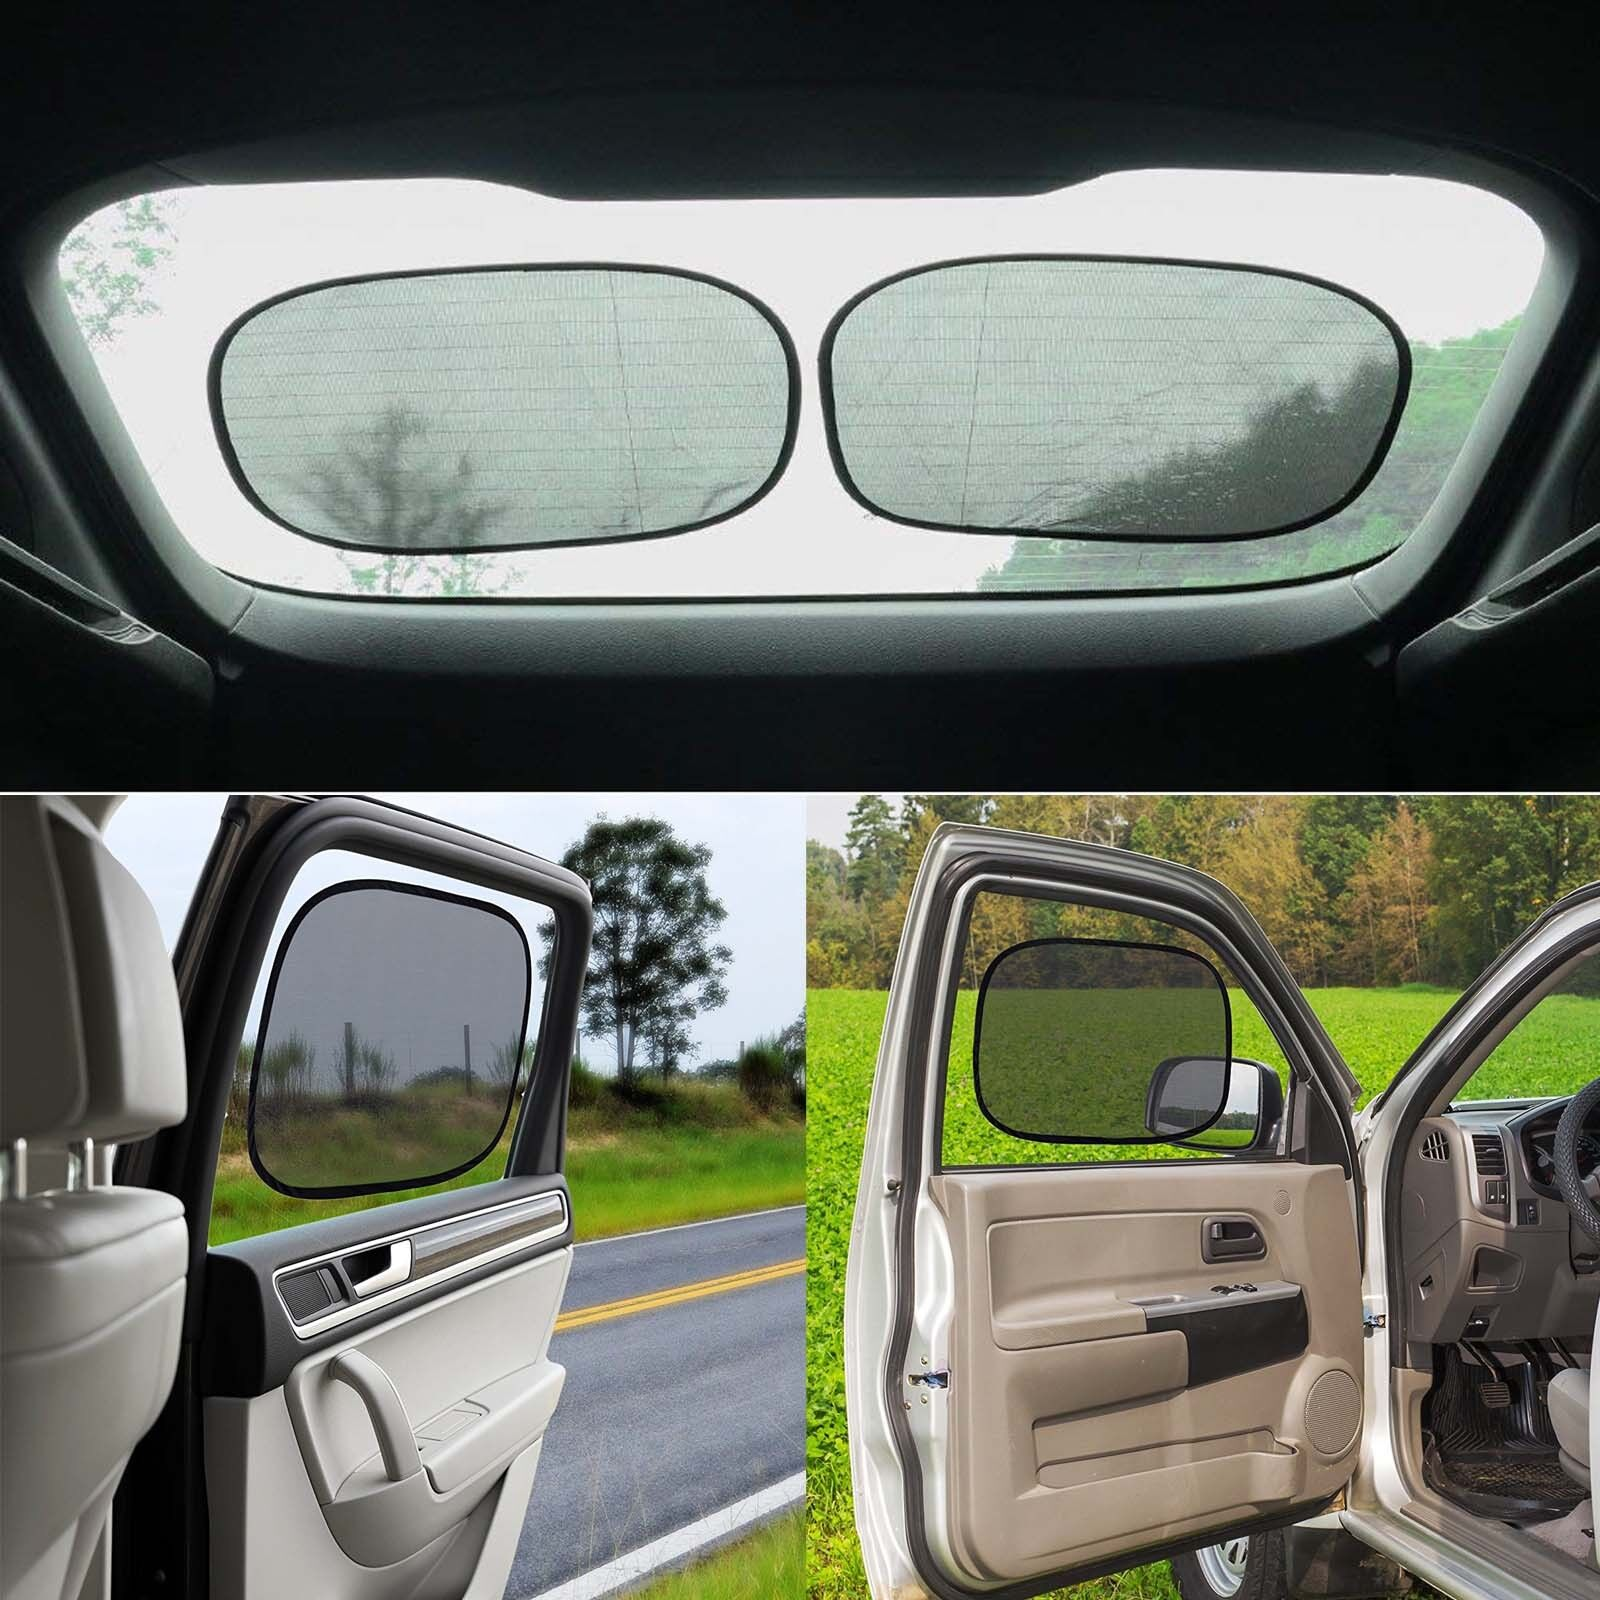 2 X Car Retractable Windshield Sun Shade Visor Folding Block Cover Front Window